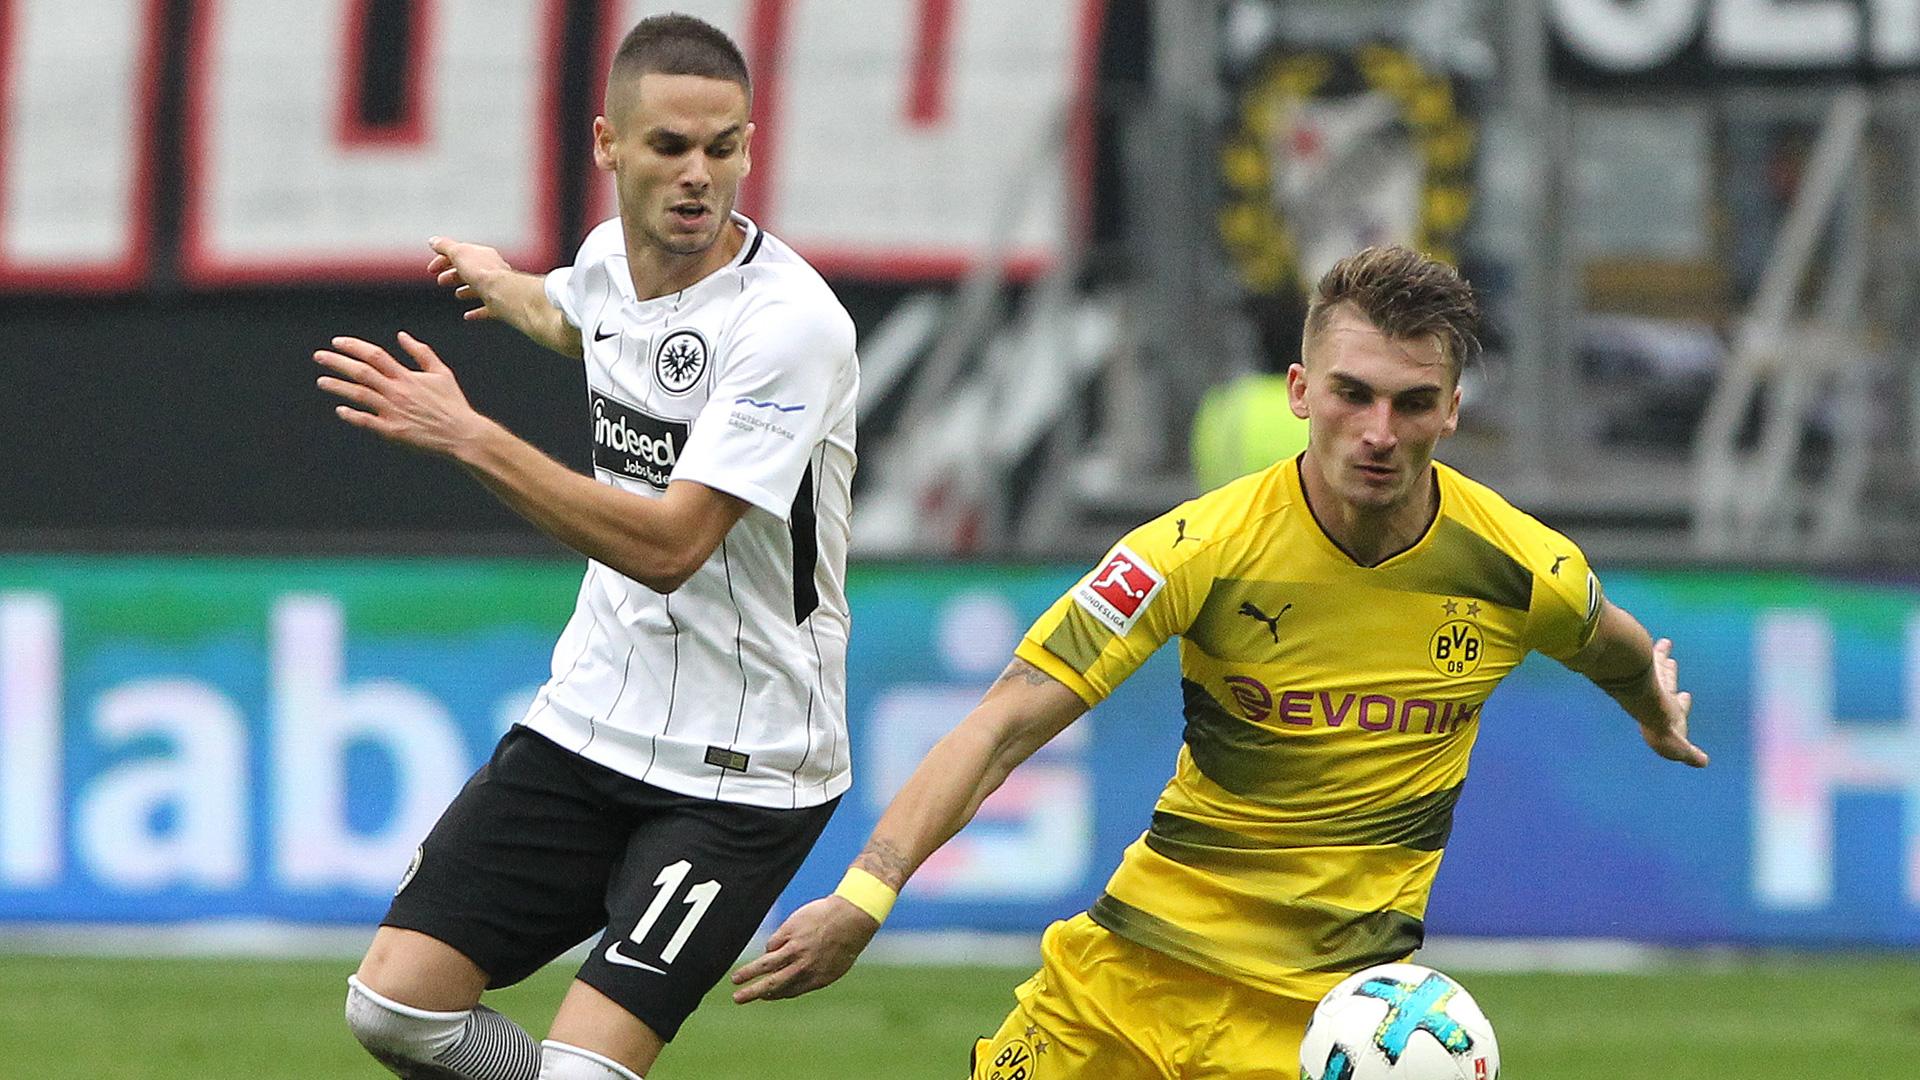 Mijat Gacinovic Eintracht Frankfurt Maximilian Philipp Borussia Dortmund 2017